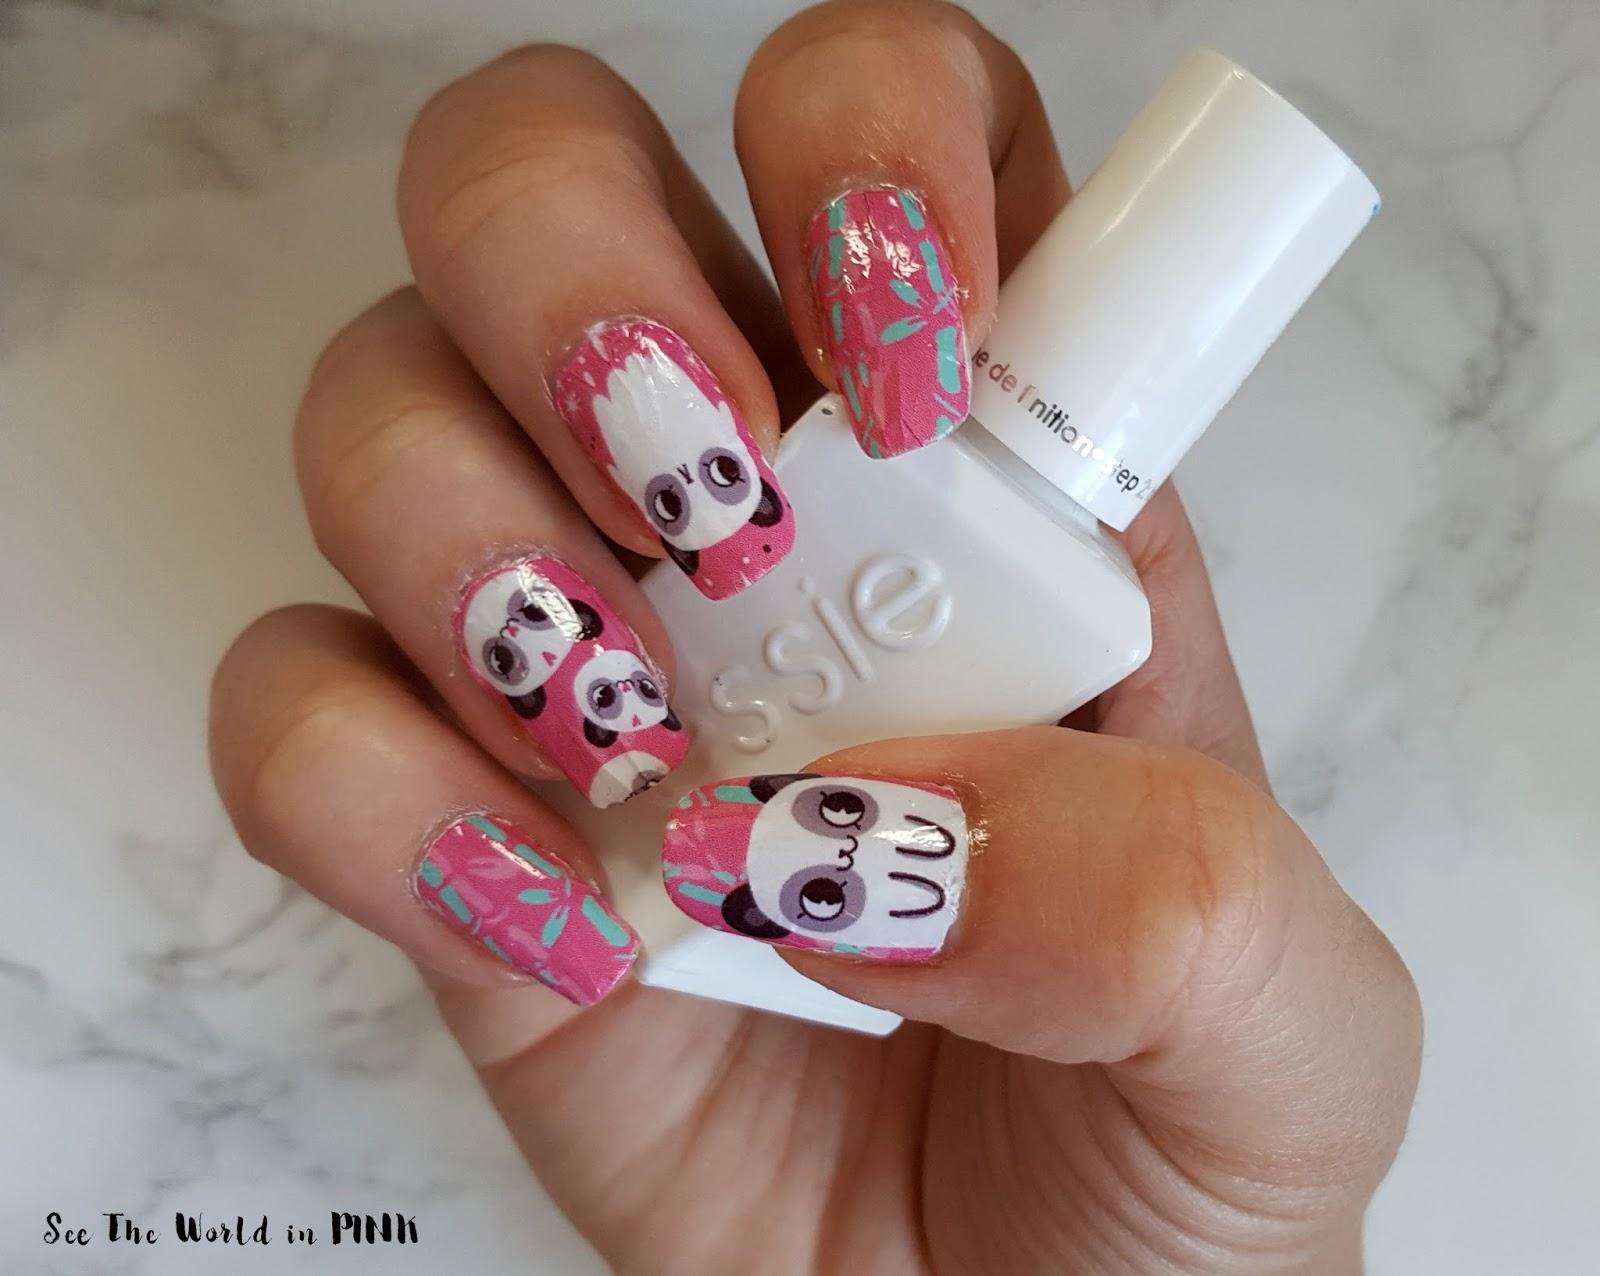 Manicure Monday - PearlPlanet Panda Pop Water Nail Decals